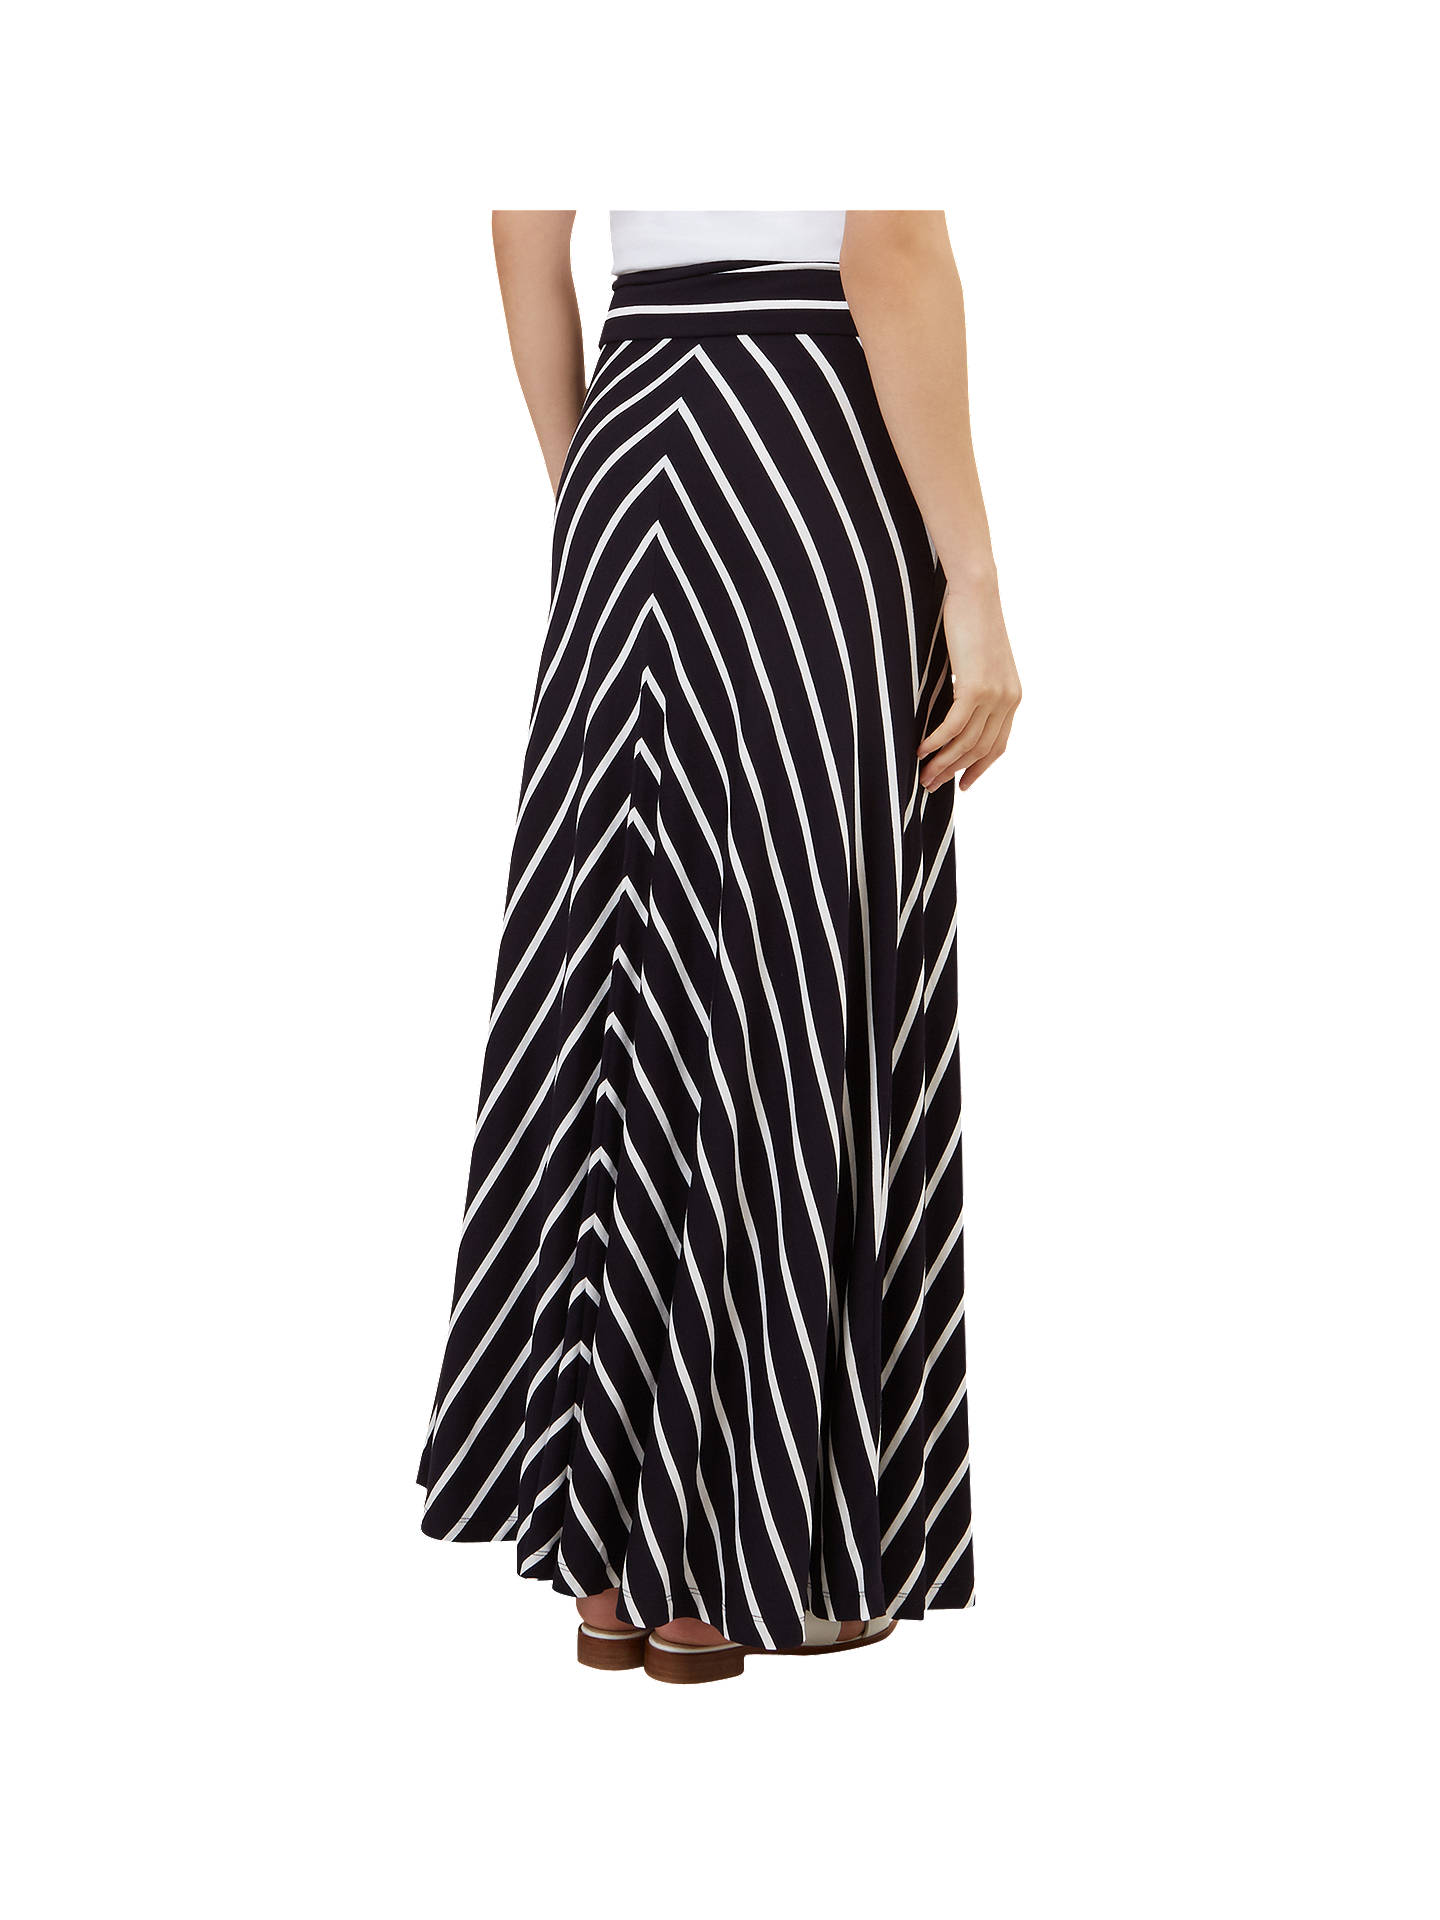 100% quality quarantee luxury fashion hot new products Hobbs Iris Striped Maxi Skirt, Navy/White at John Lewis ...